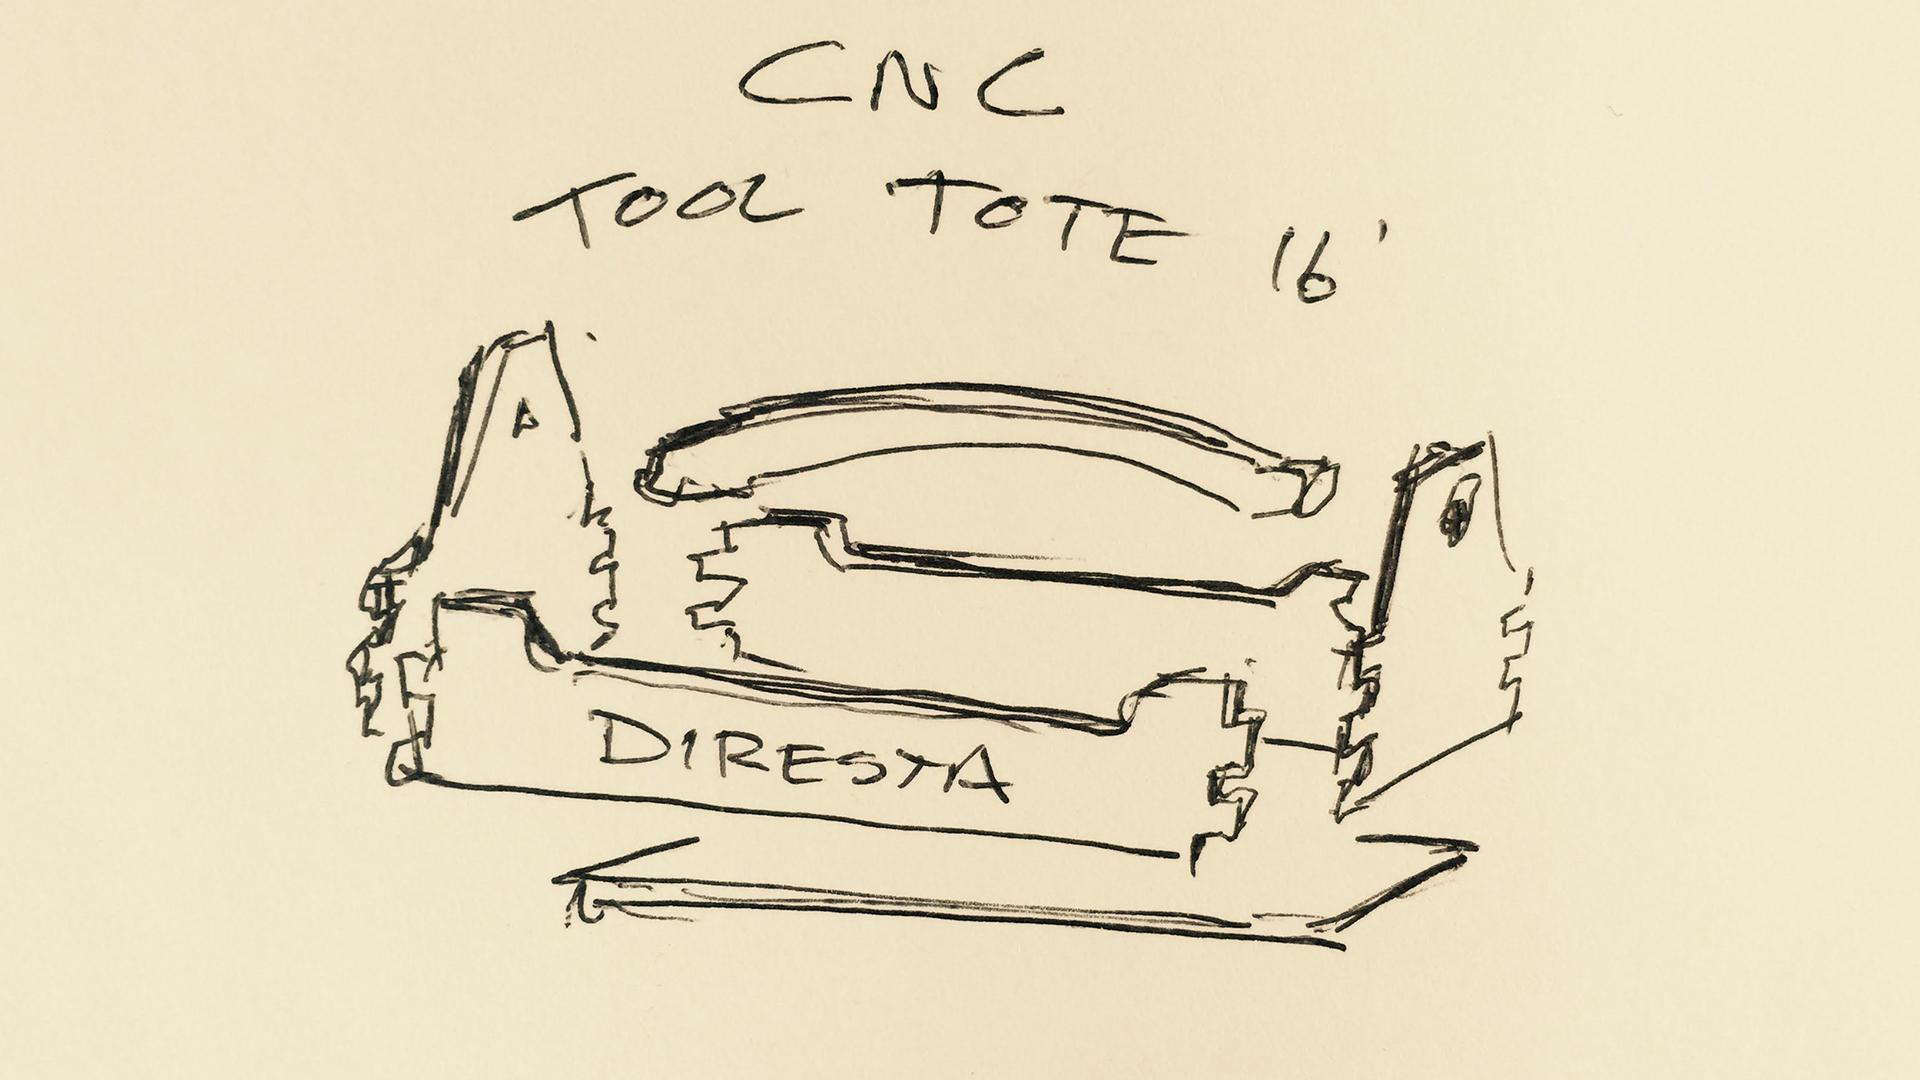 DiResta: CNC Tool Tote